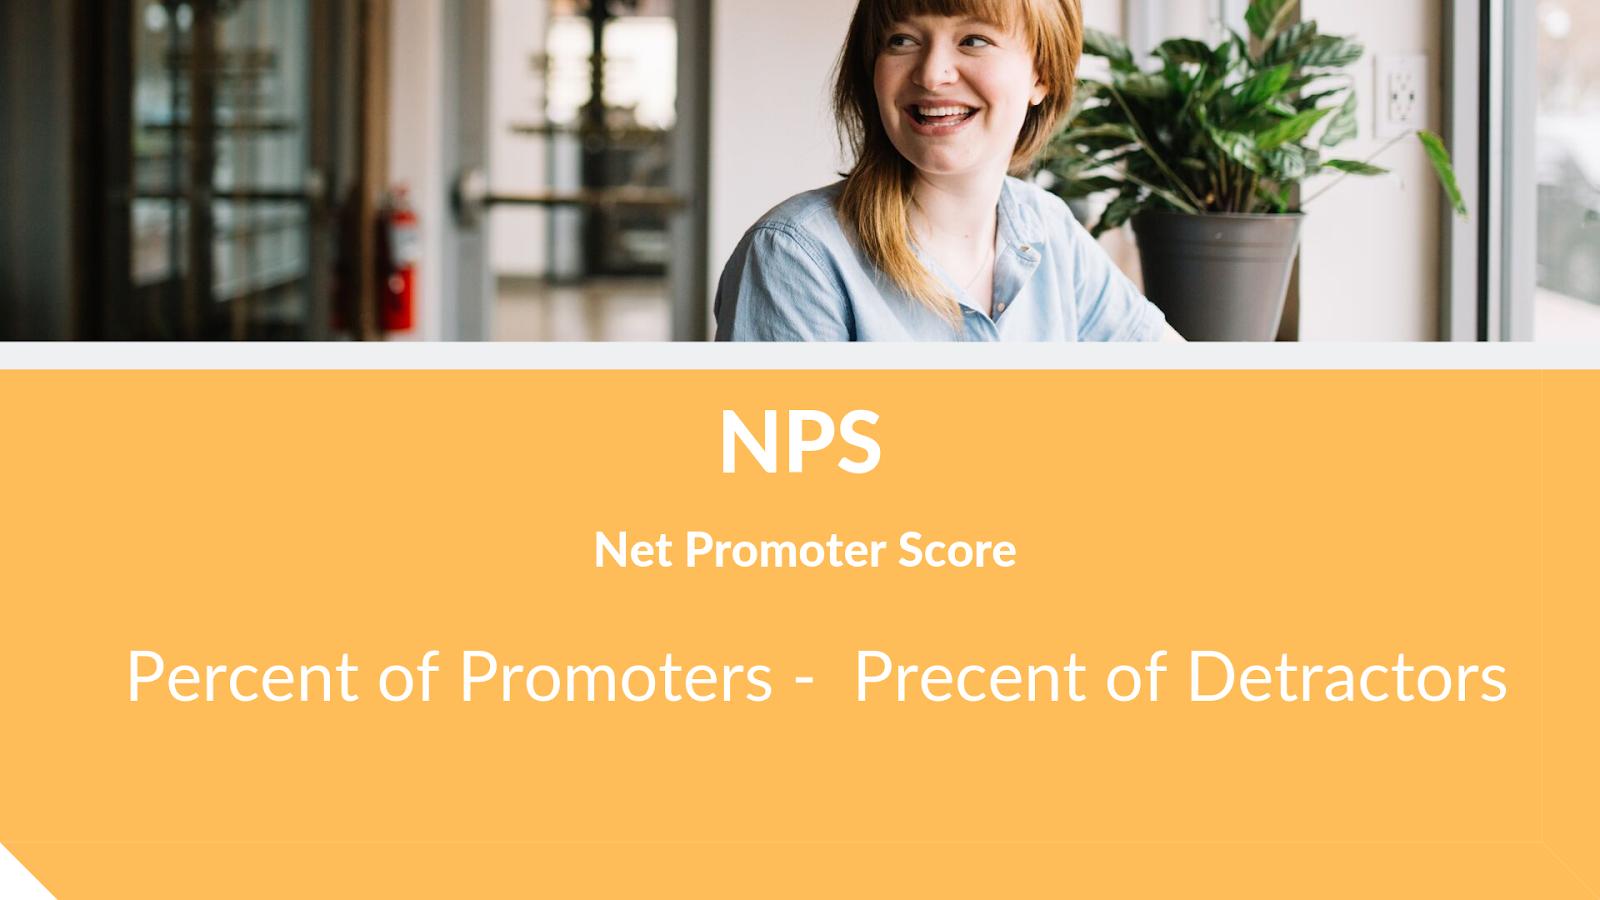 Net Promoter Score - Measuring loyalty